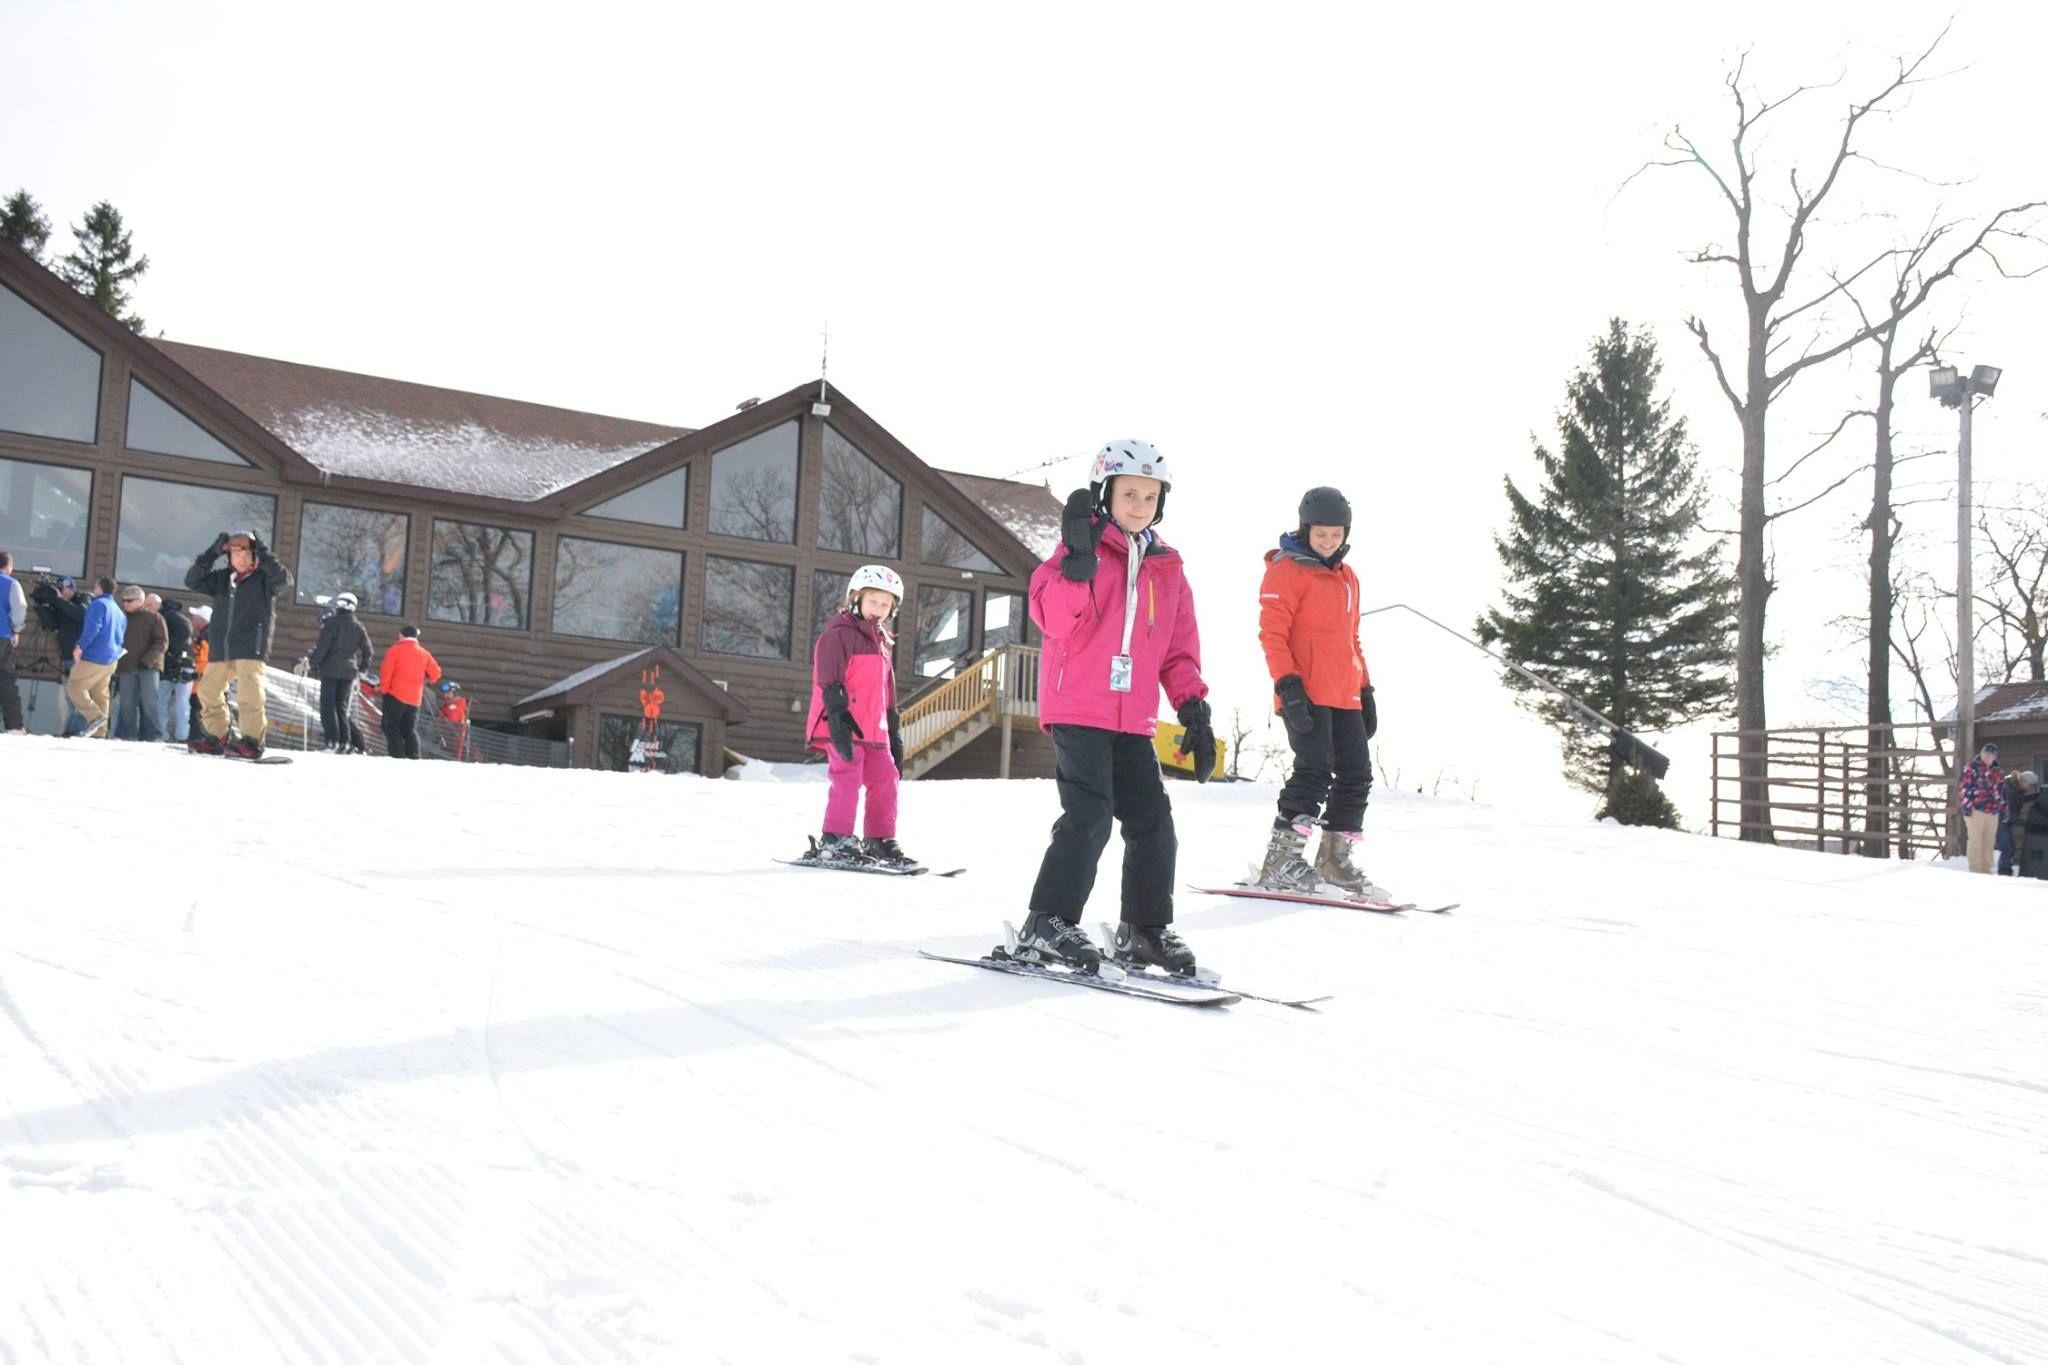 Laurel Mountain Ski Resort (With images) Skiing, Laurel